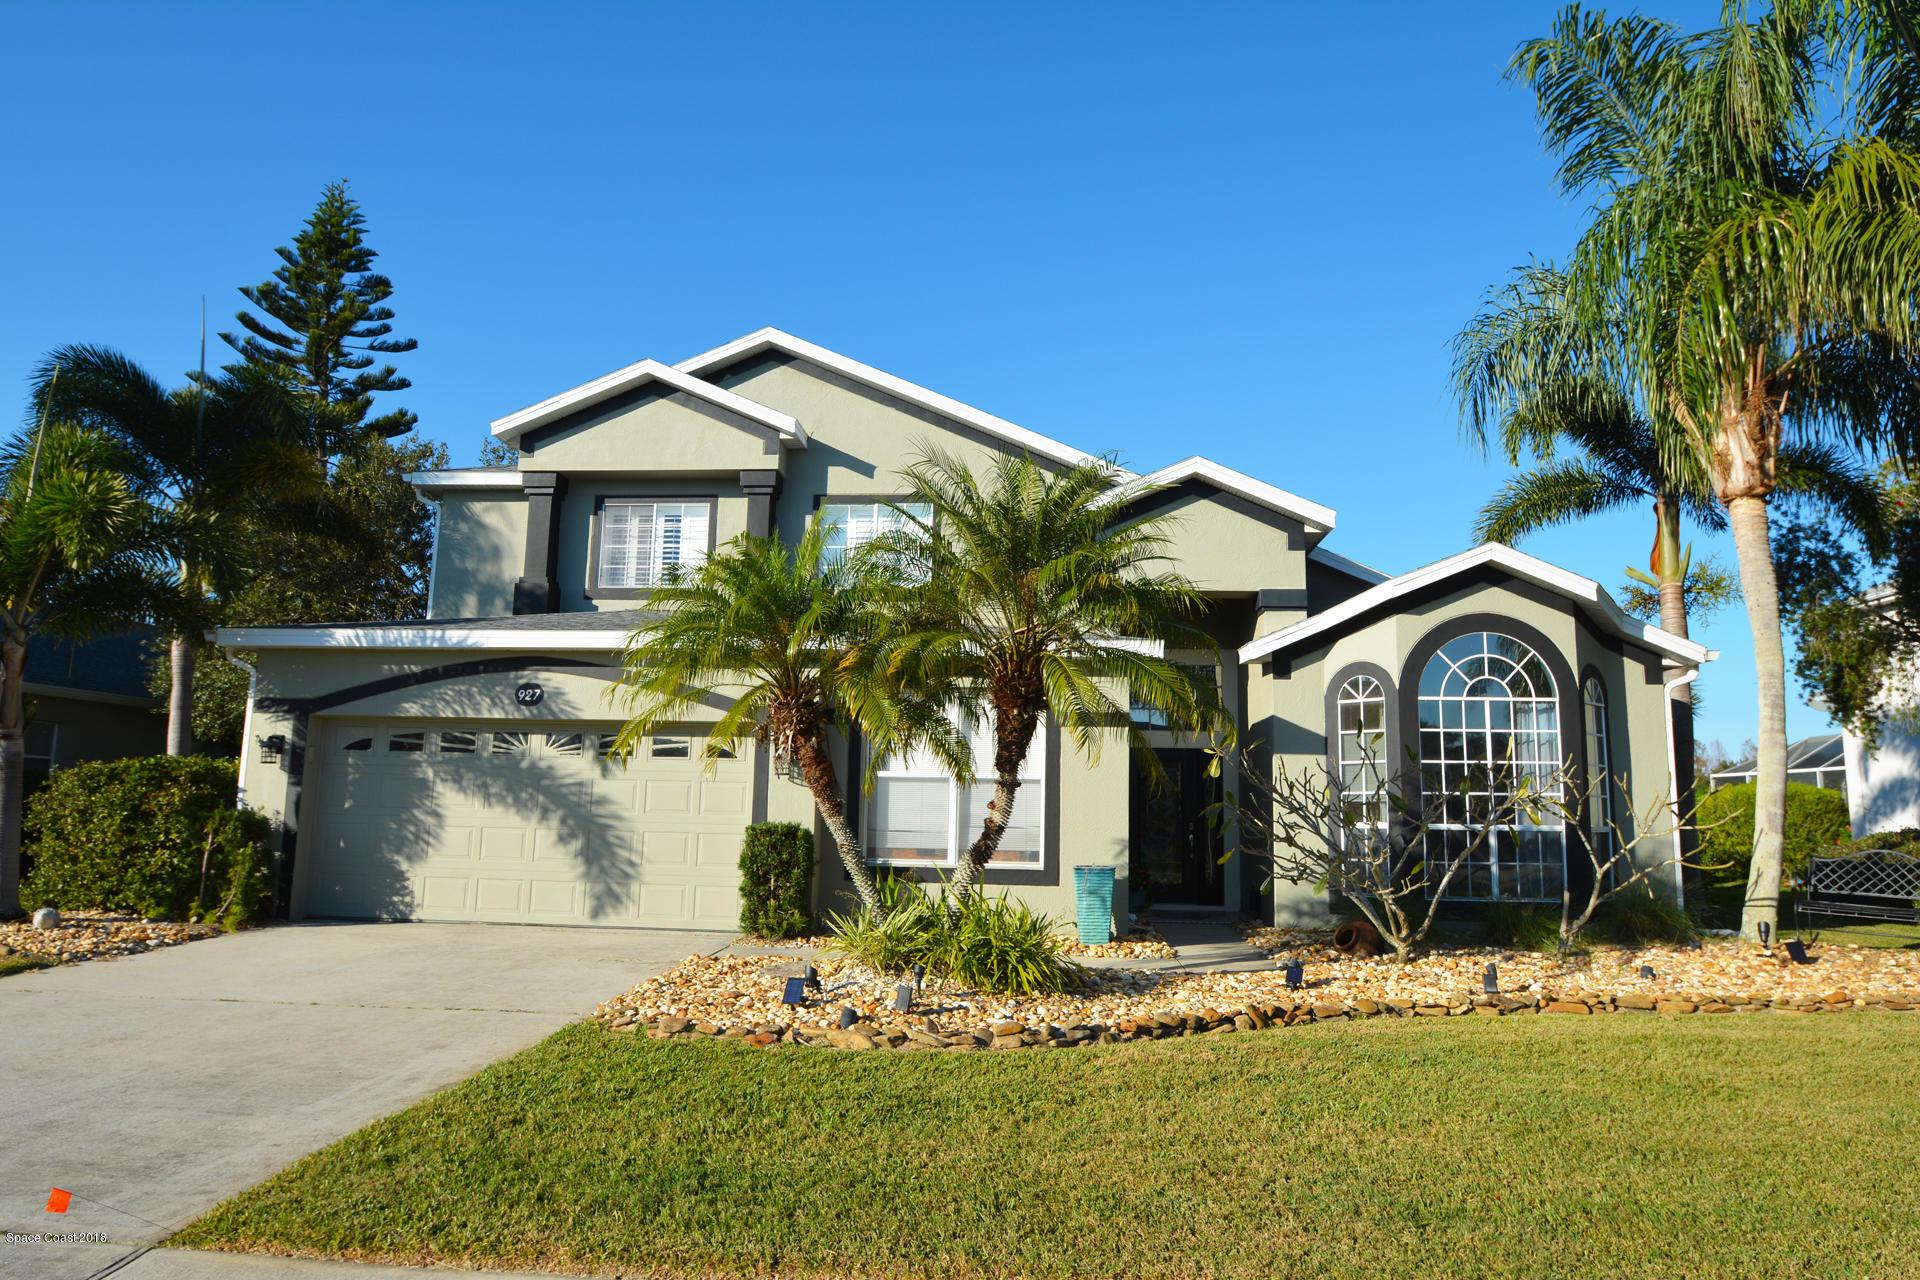 Single Family Home for Sale at 927 Fostoria 927 Fostoria Melbourne, Florida 32940 United States